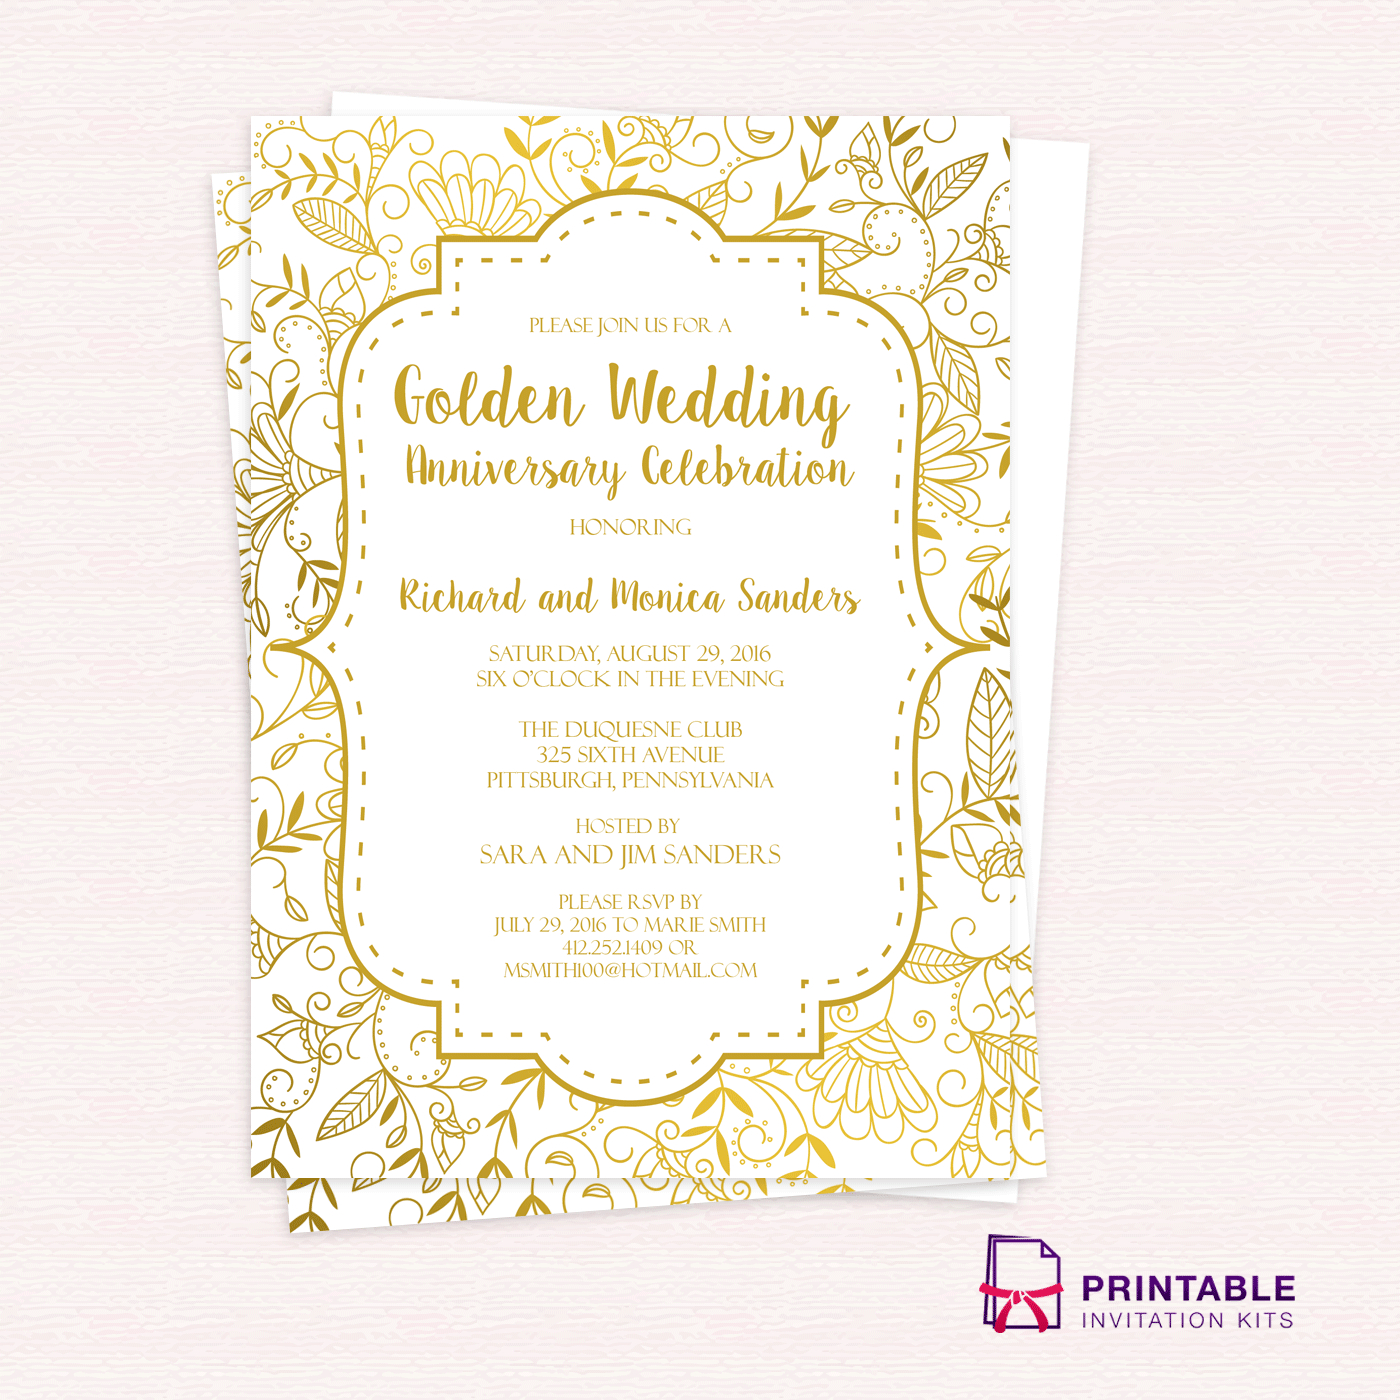 Golden Wedding Anniversary Invitation Template ← Wedding Invitation - Free Printable 50Th Wedding Anniversary Invitation Templates